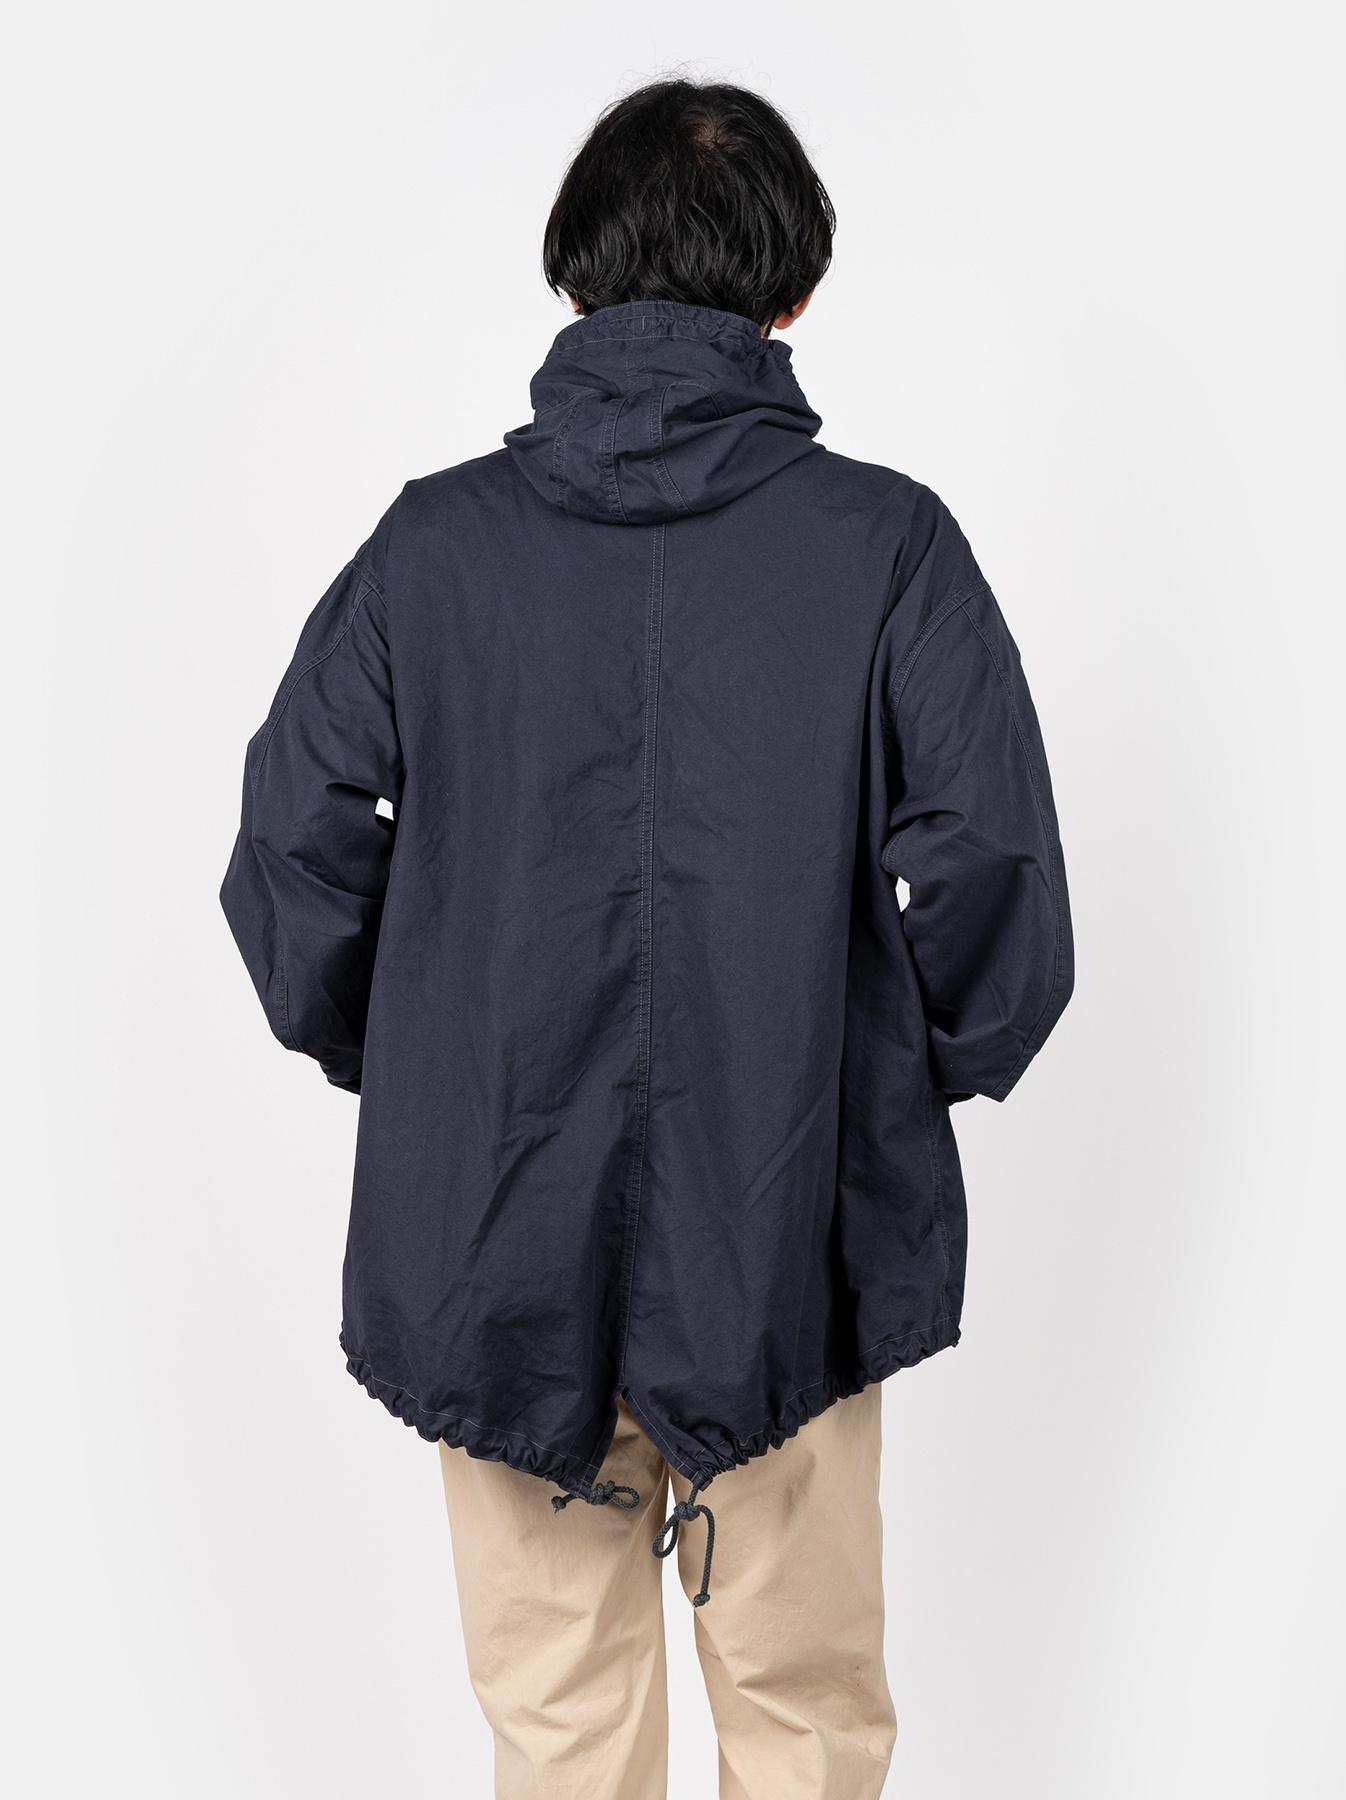 Weather Cloth Umahiko Mods Hoodie-5